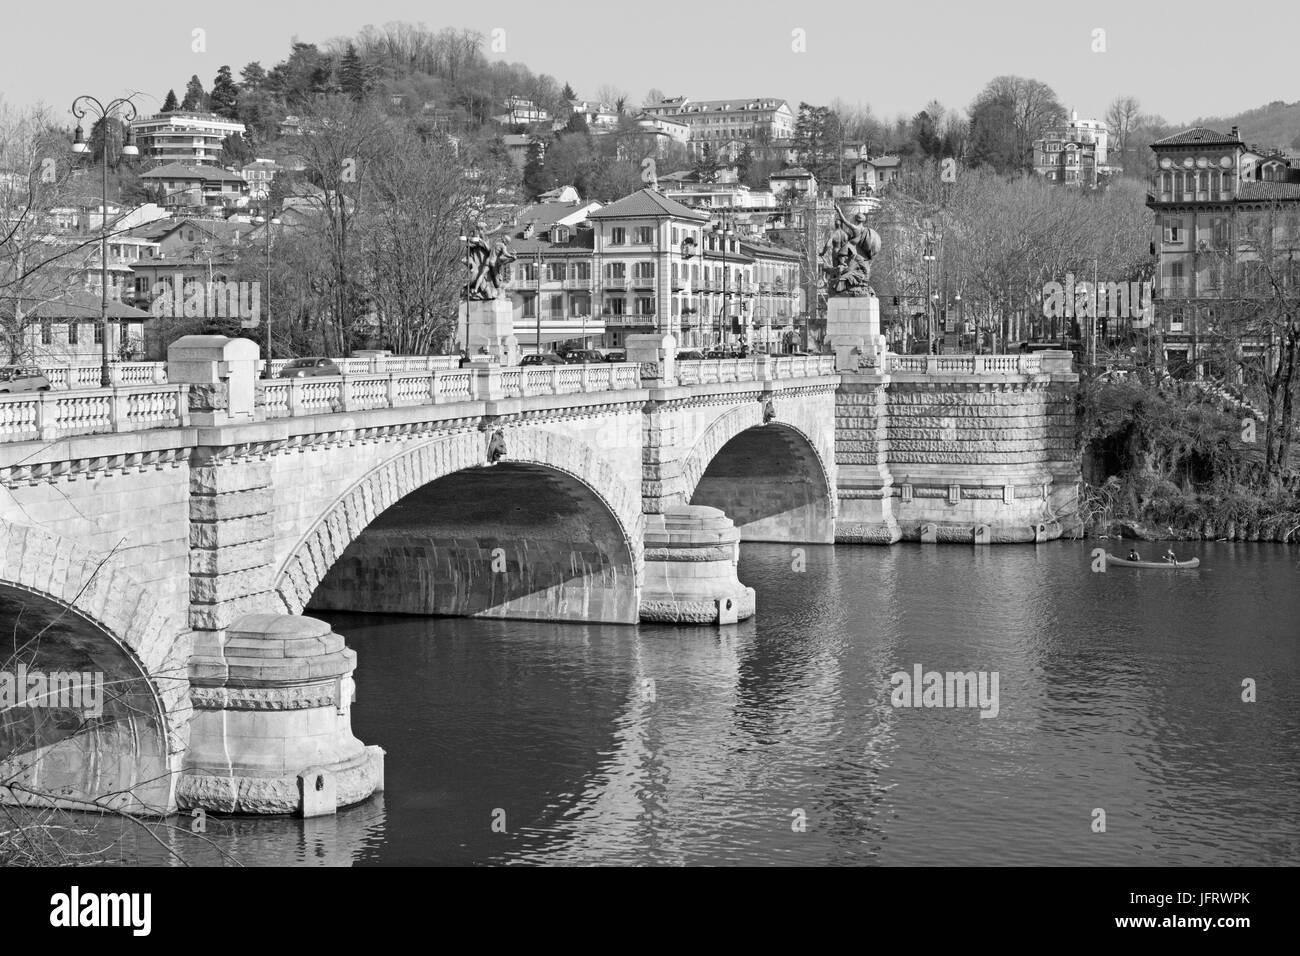 Turin - die Brücke Umberto ich. Stockfoto